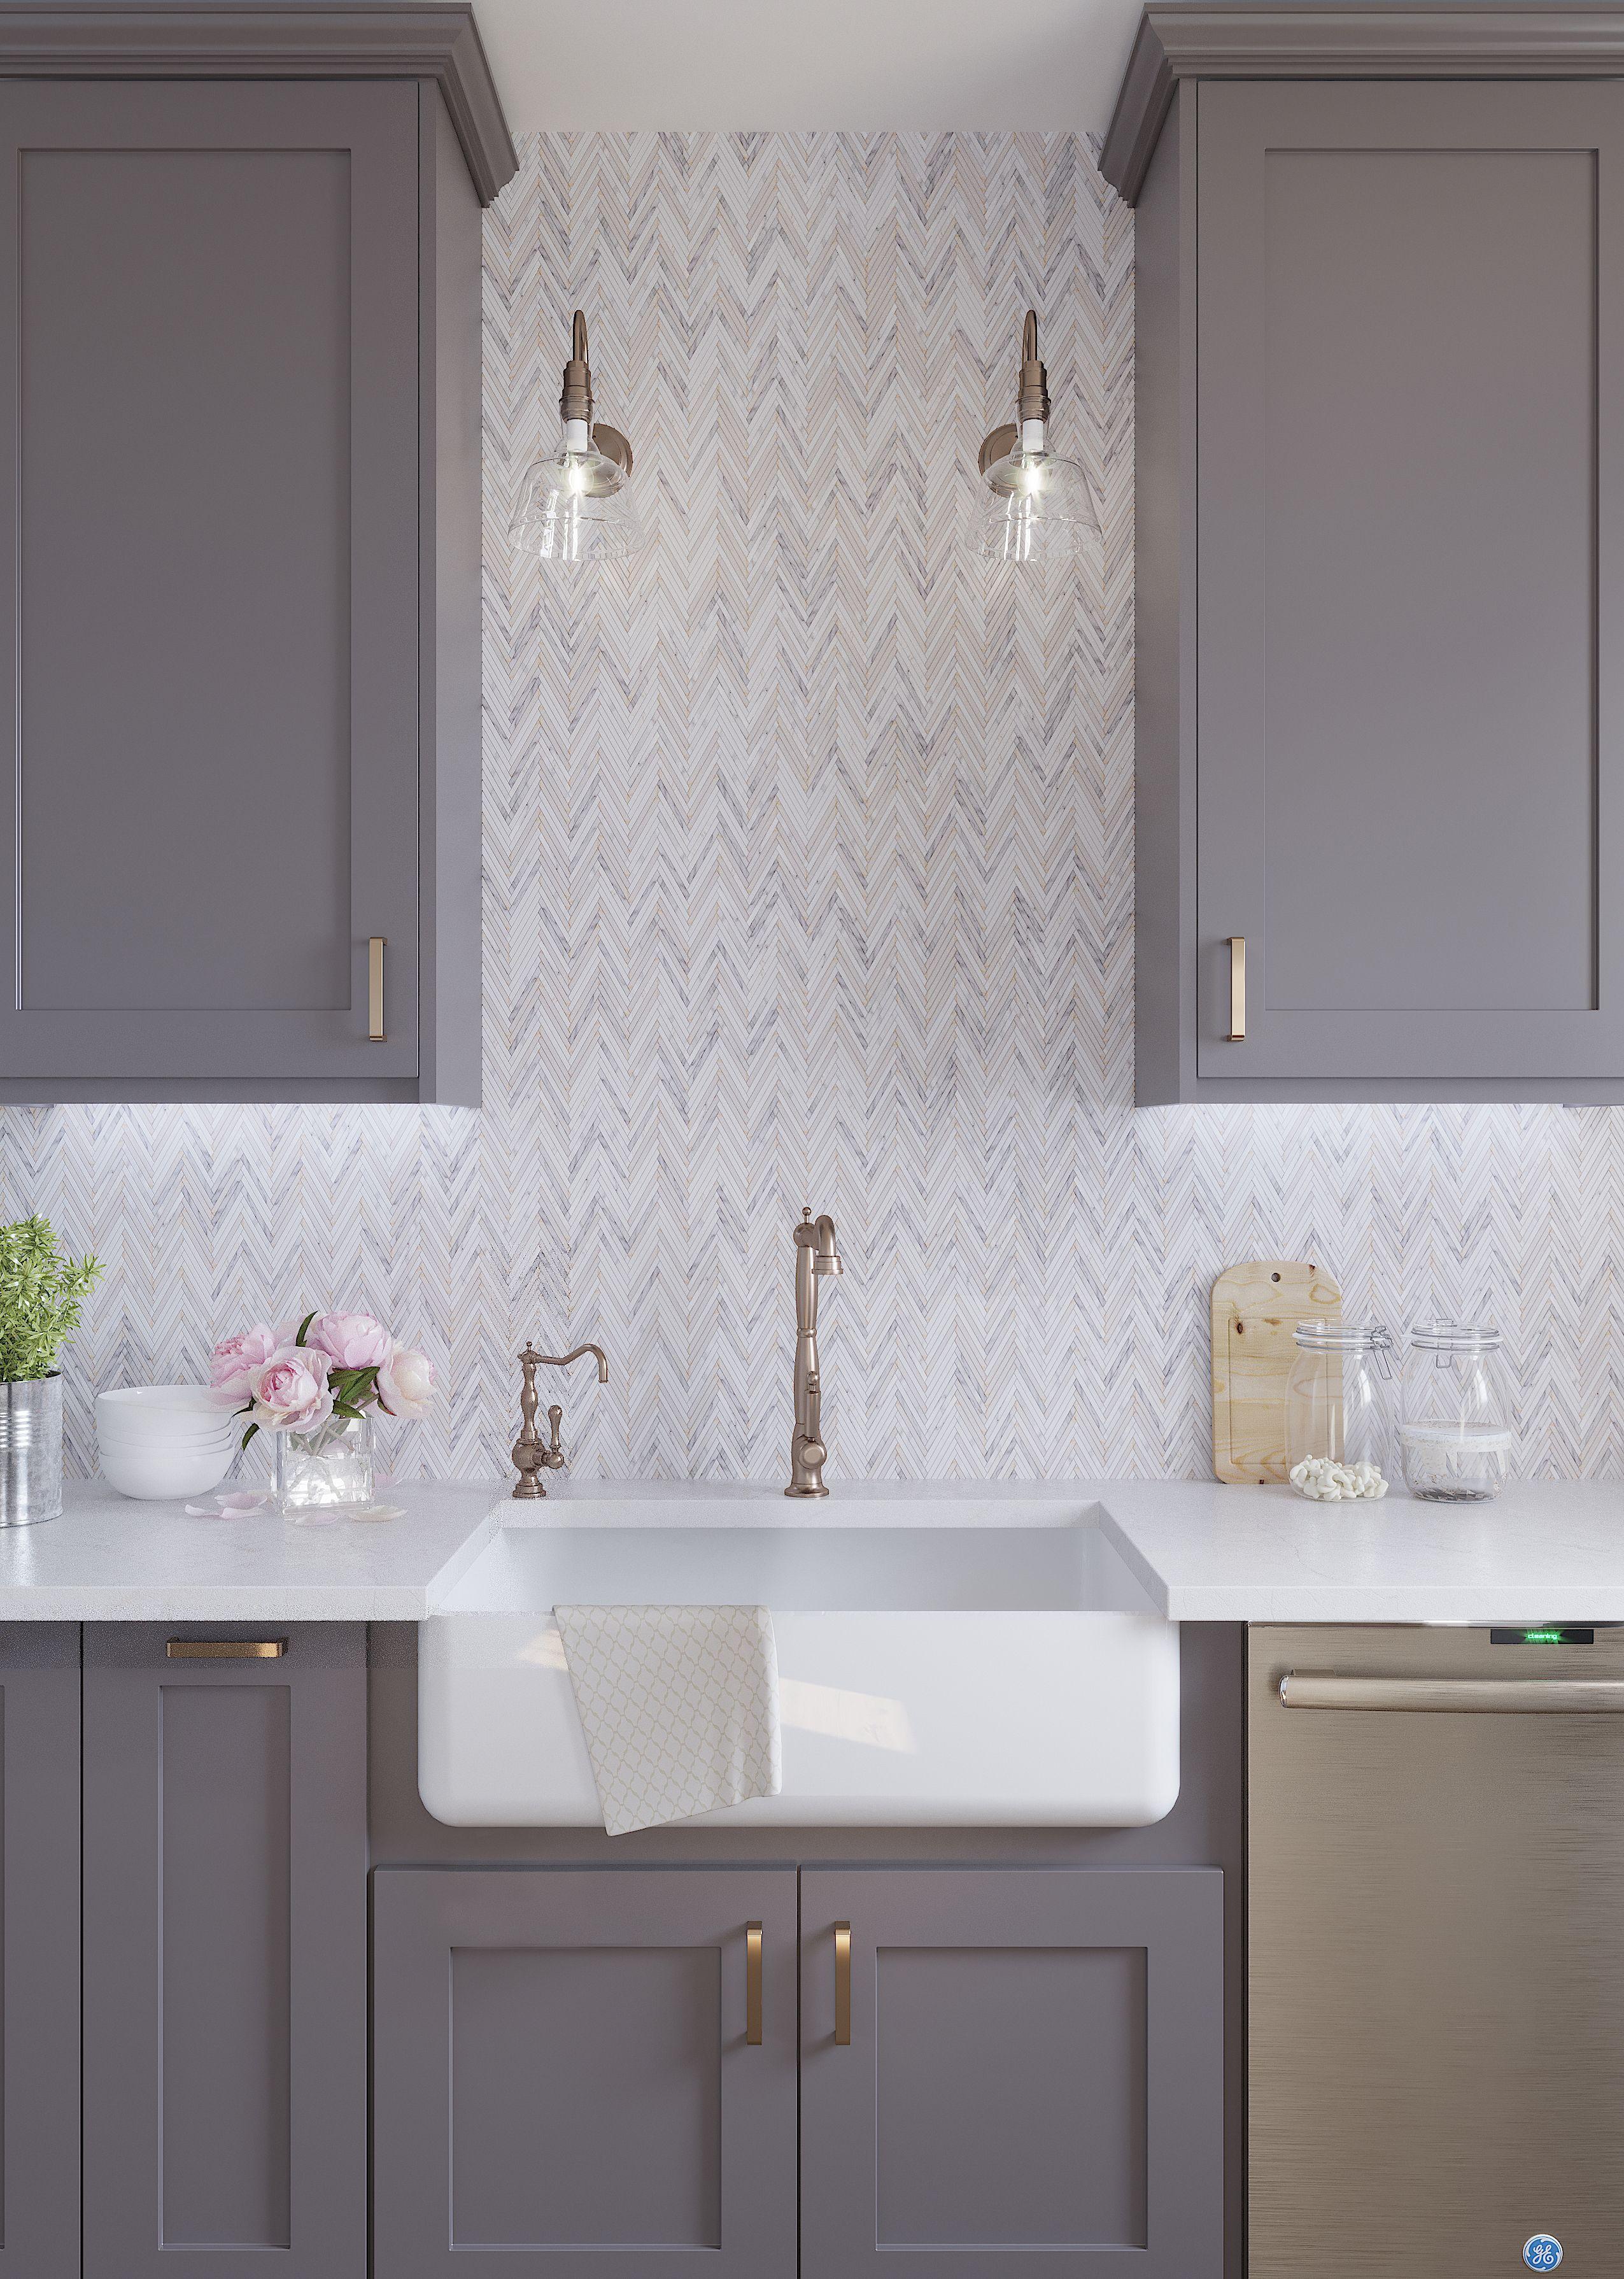 - Skinny Chevron Calacatta Gold Mosaic Tile Modern Kitchen